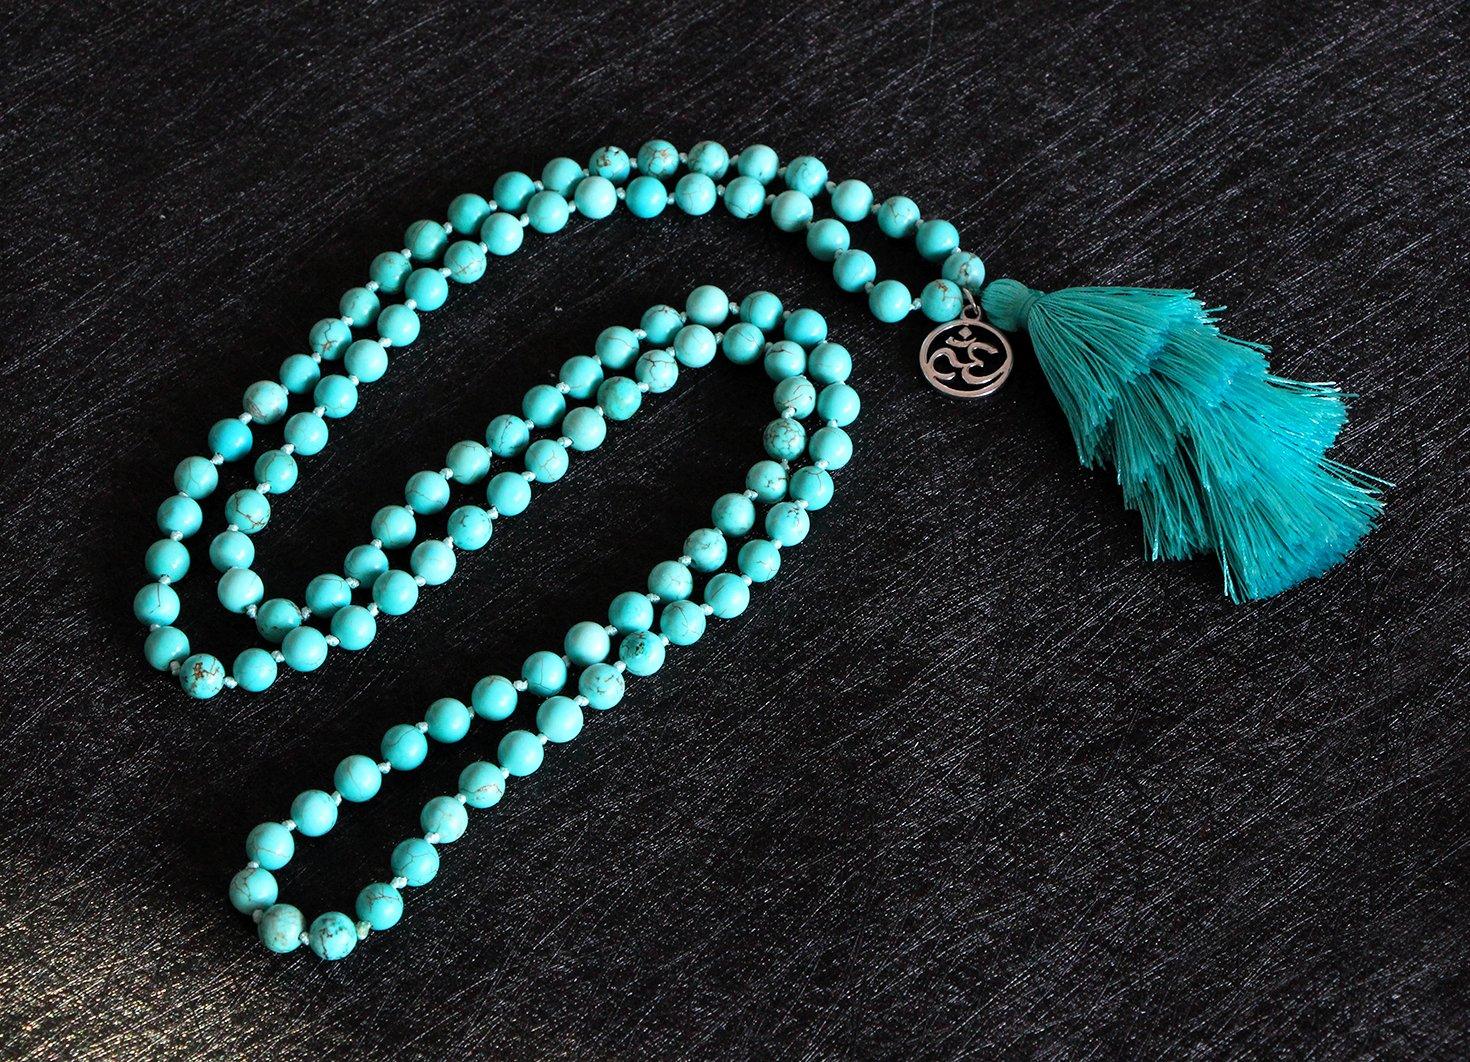 MHZ JEWELS Turquoise Mala Beads Necklace Bracelet Gemstone Prayer Beaded Meditation Yoga Necklace for Women by MHZ JEWELS (Image #5)